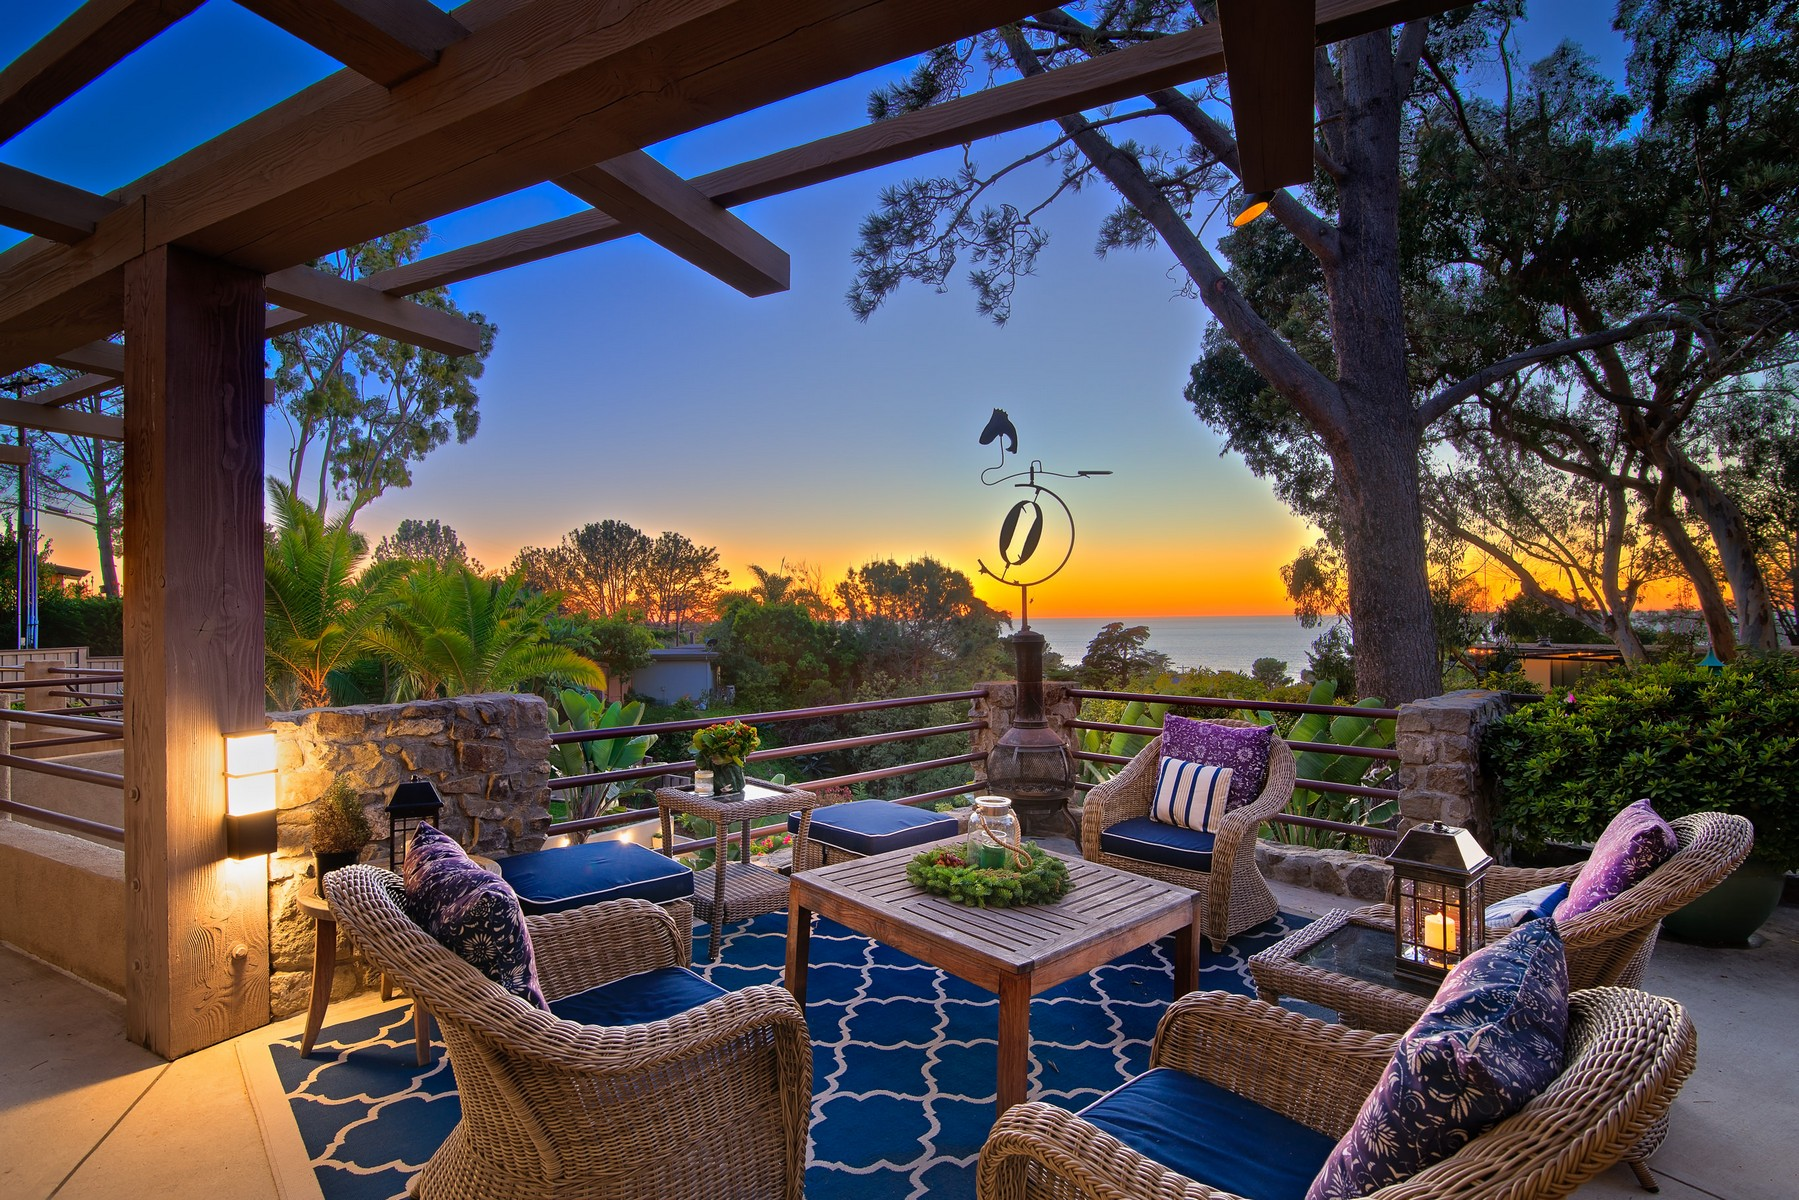 Single Family Home for Sale at 645 Amphitheatre Drive Del Mar, California, 92014 United States